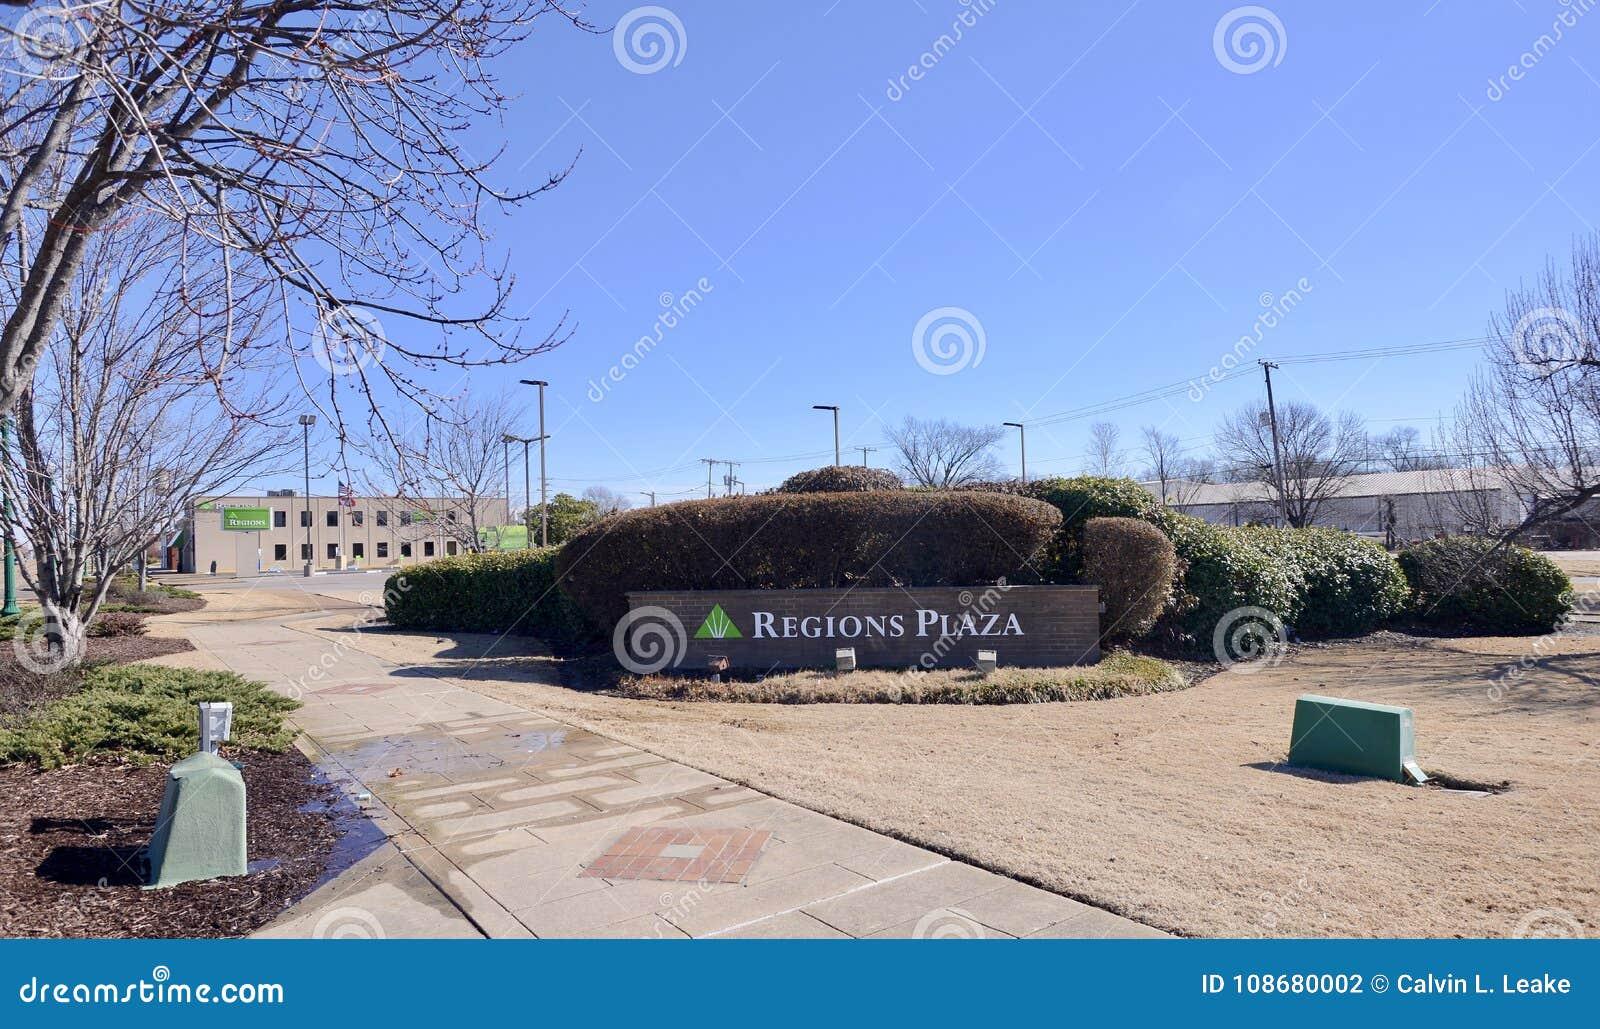 Regions Bank Plaza, West Memphis, Arkansas Editorial